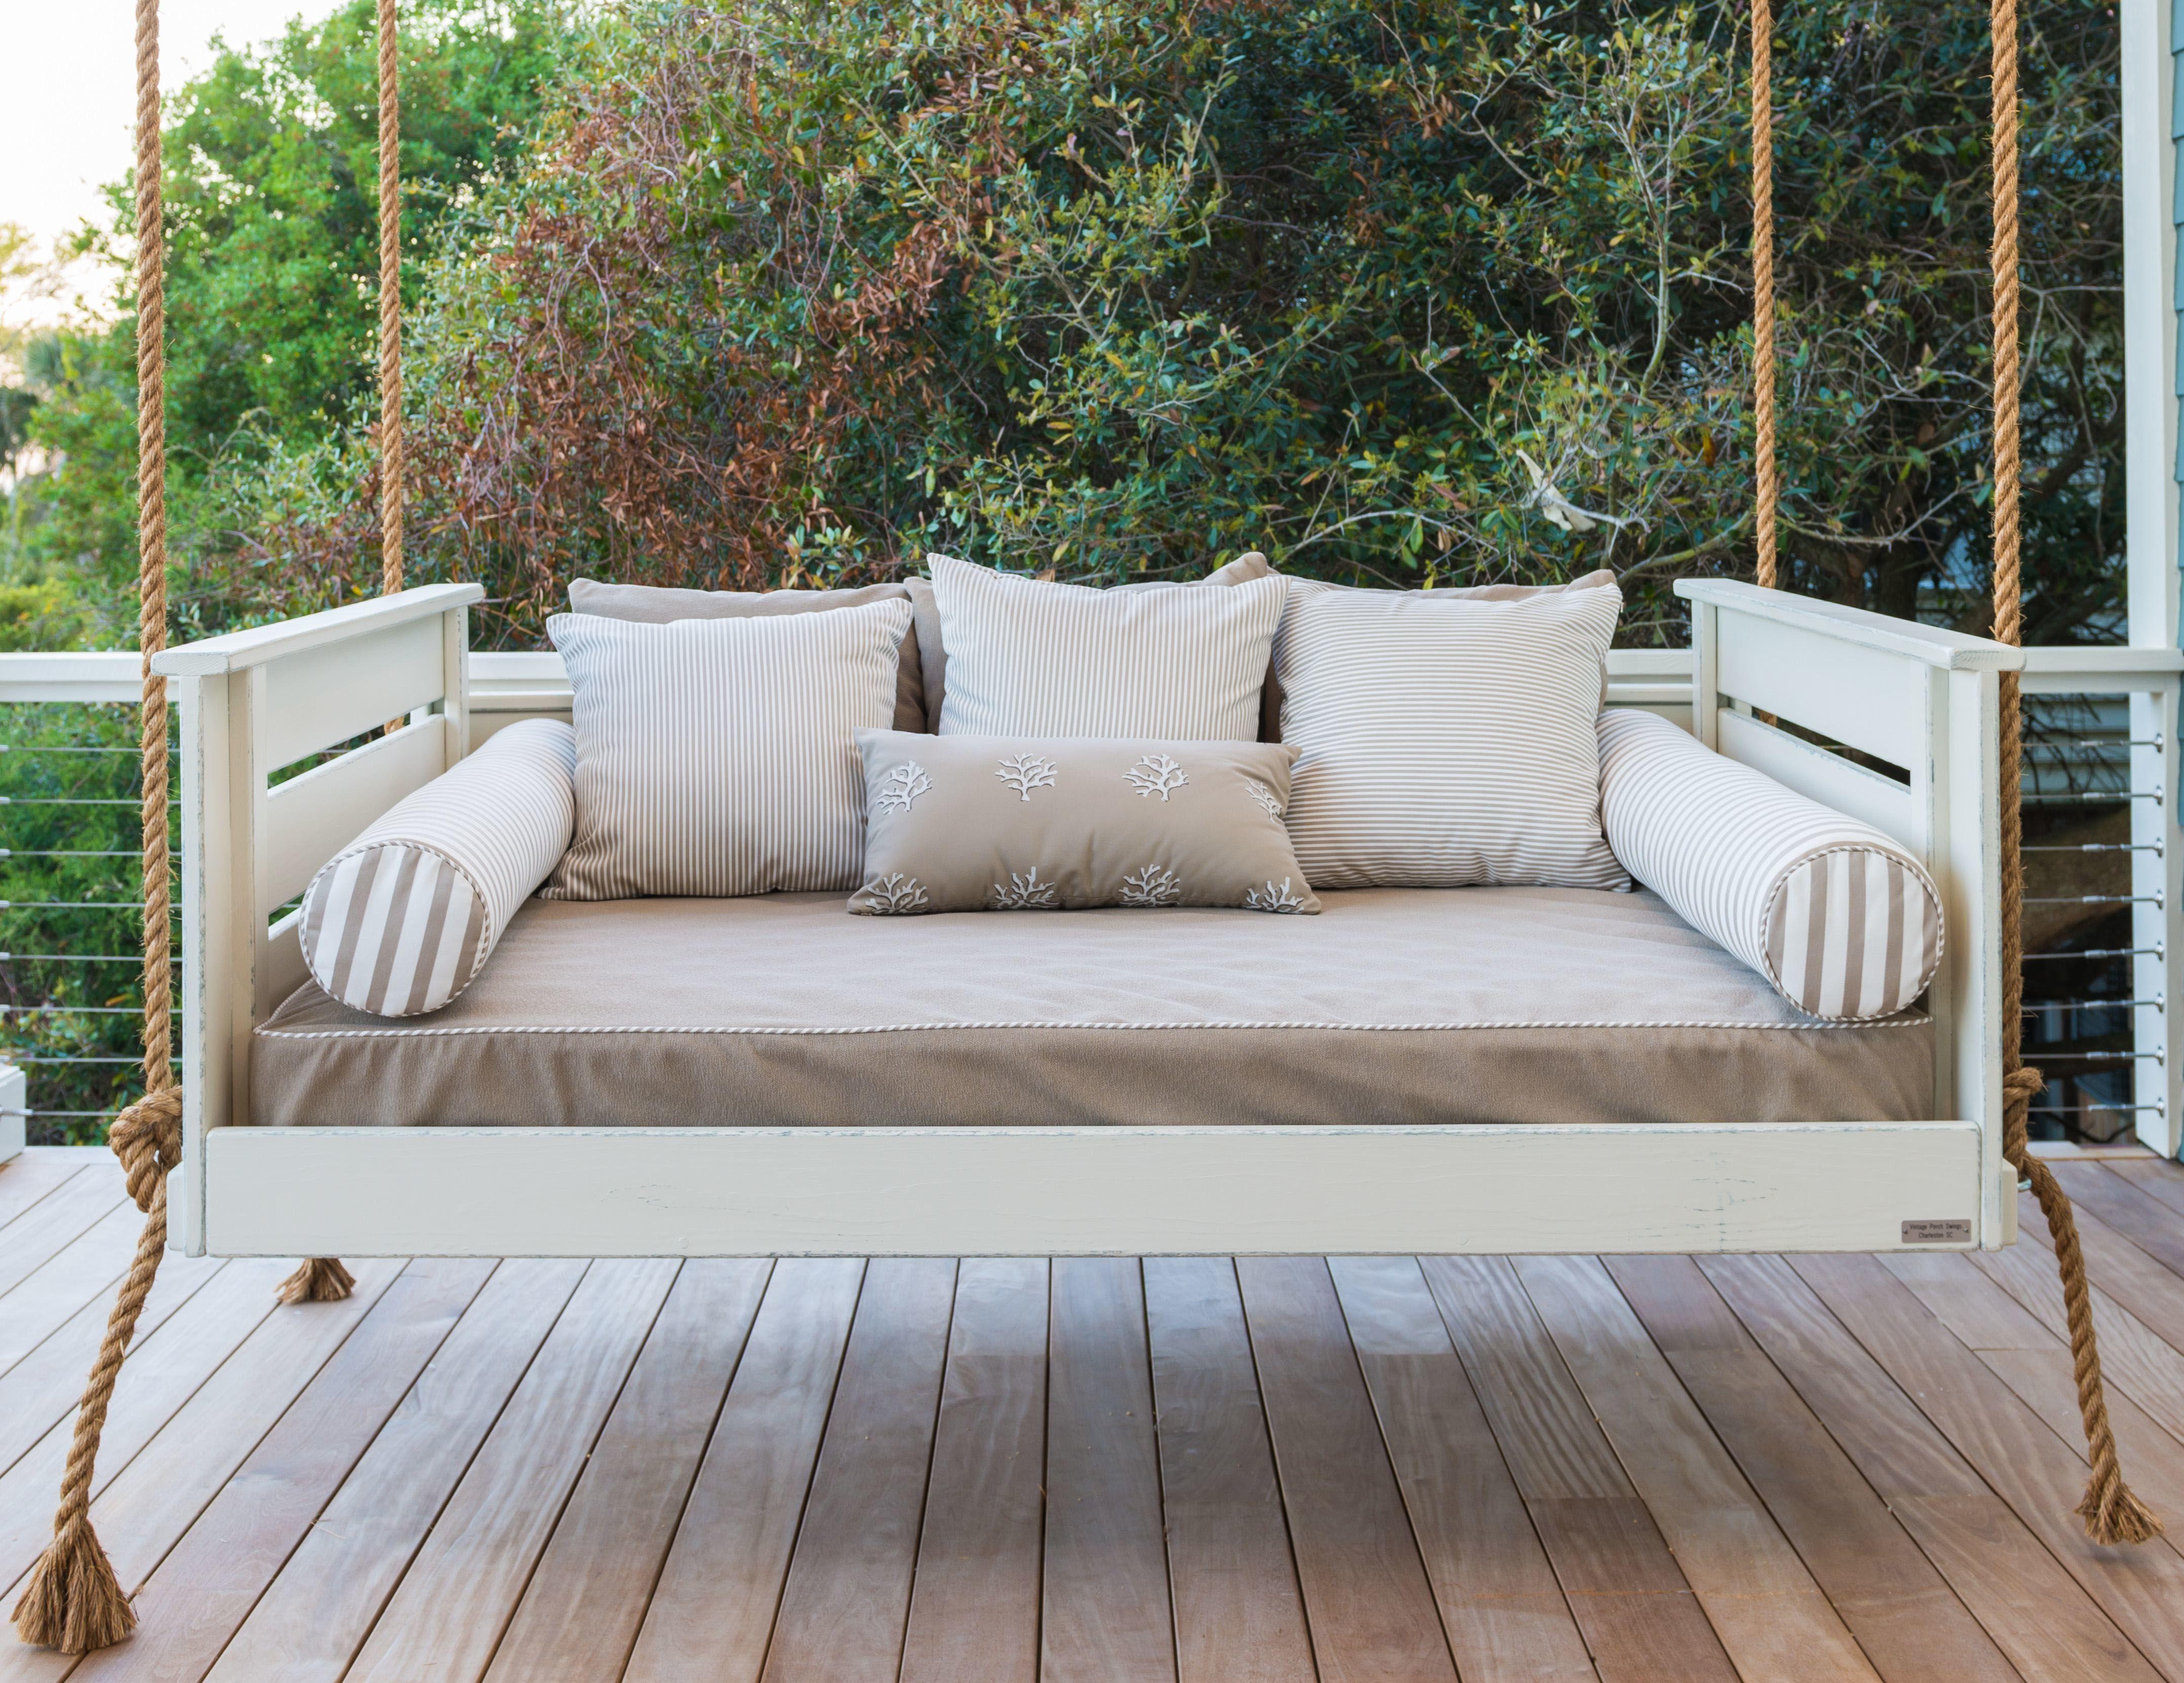 12 Free Porch Swing Plans Vintage Porch Swings Porch Swing Porch Swing Bed